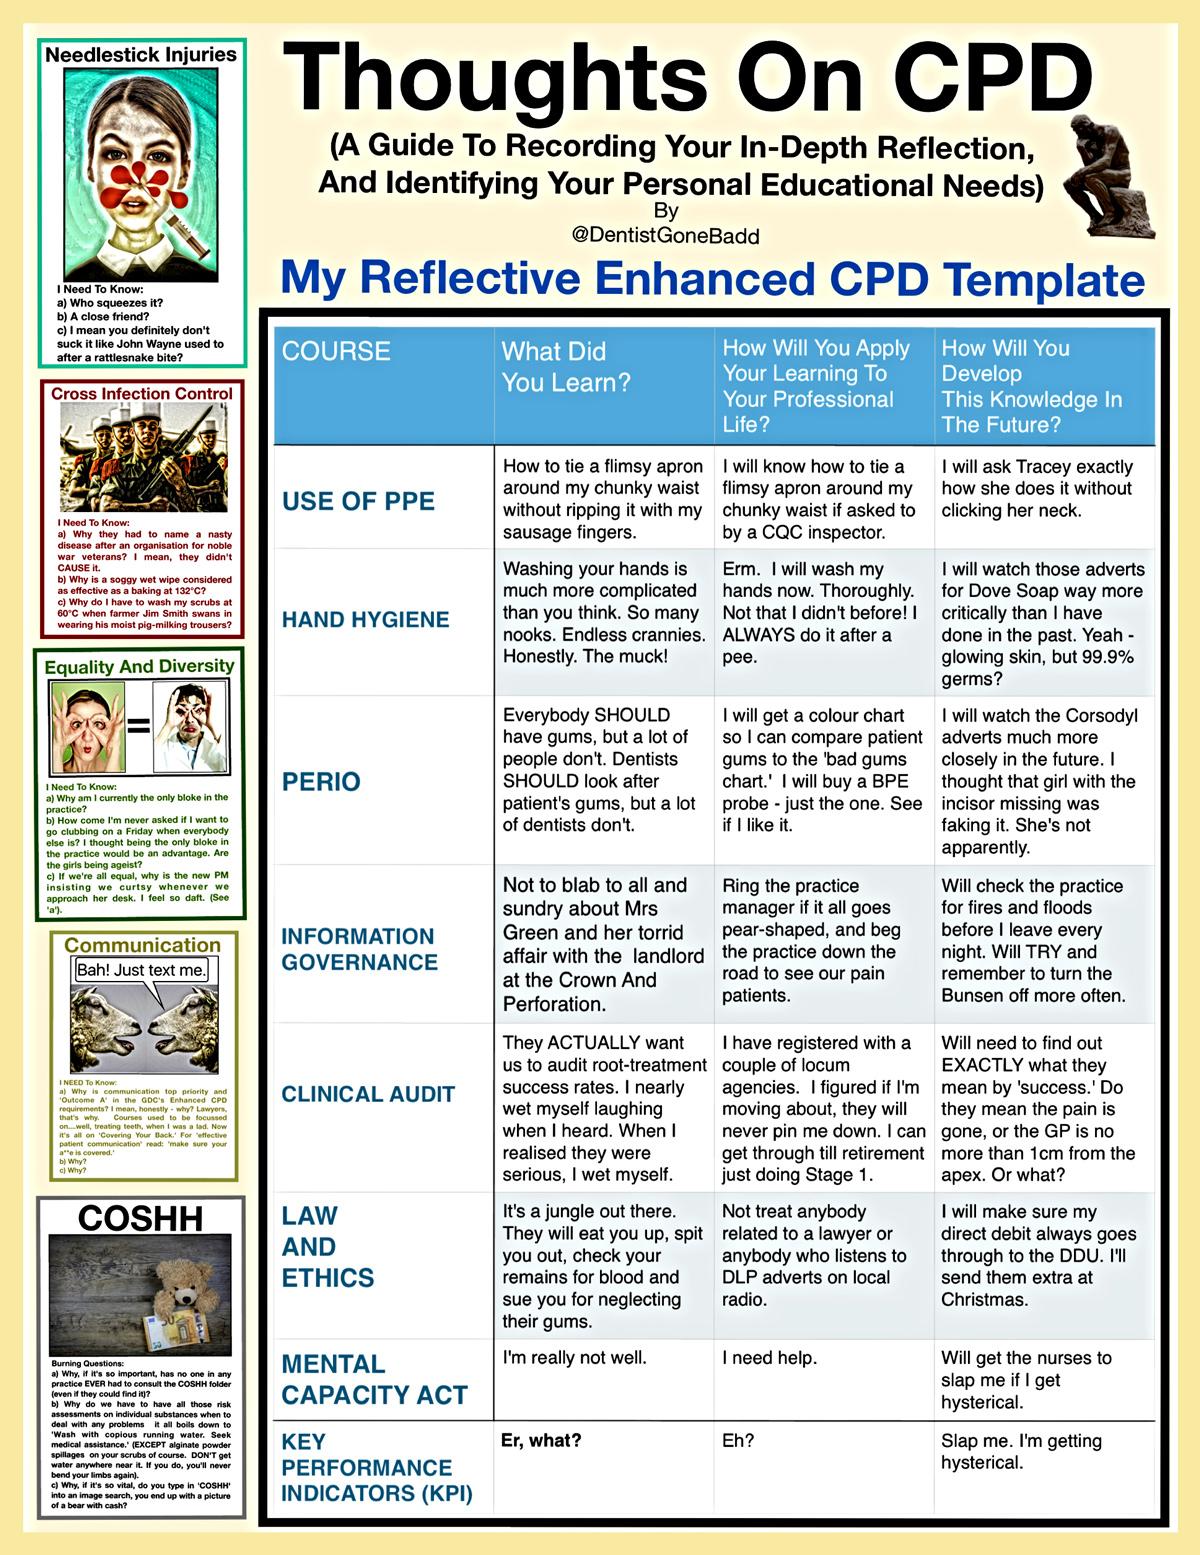 Enhanced CPD